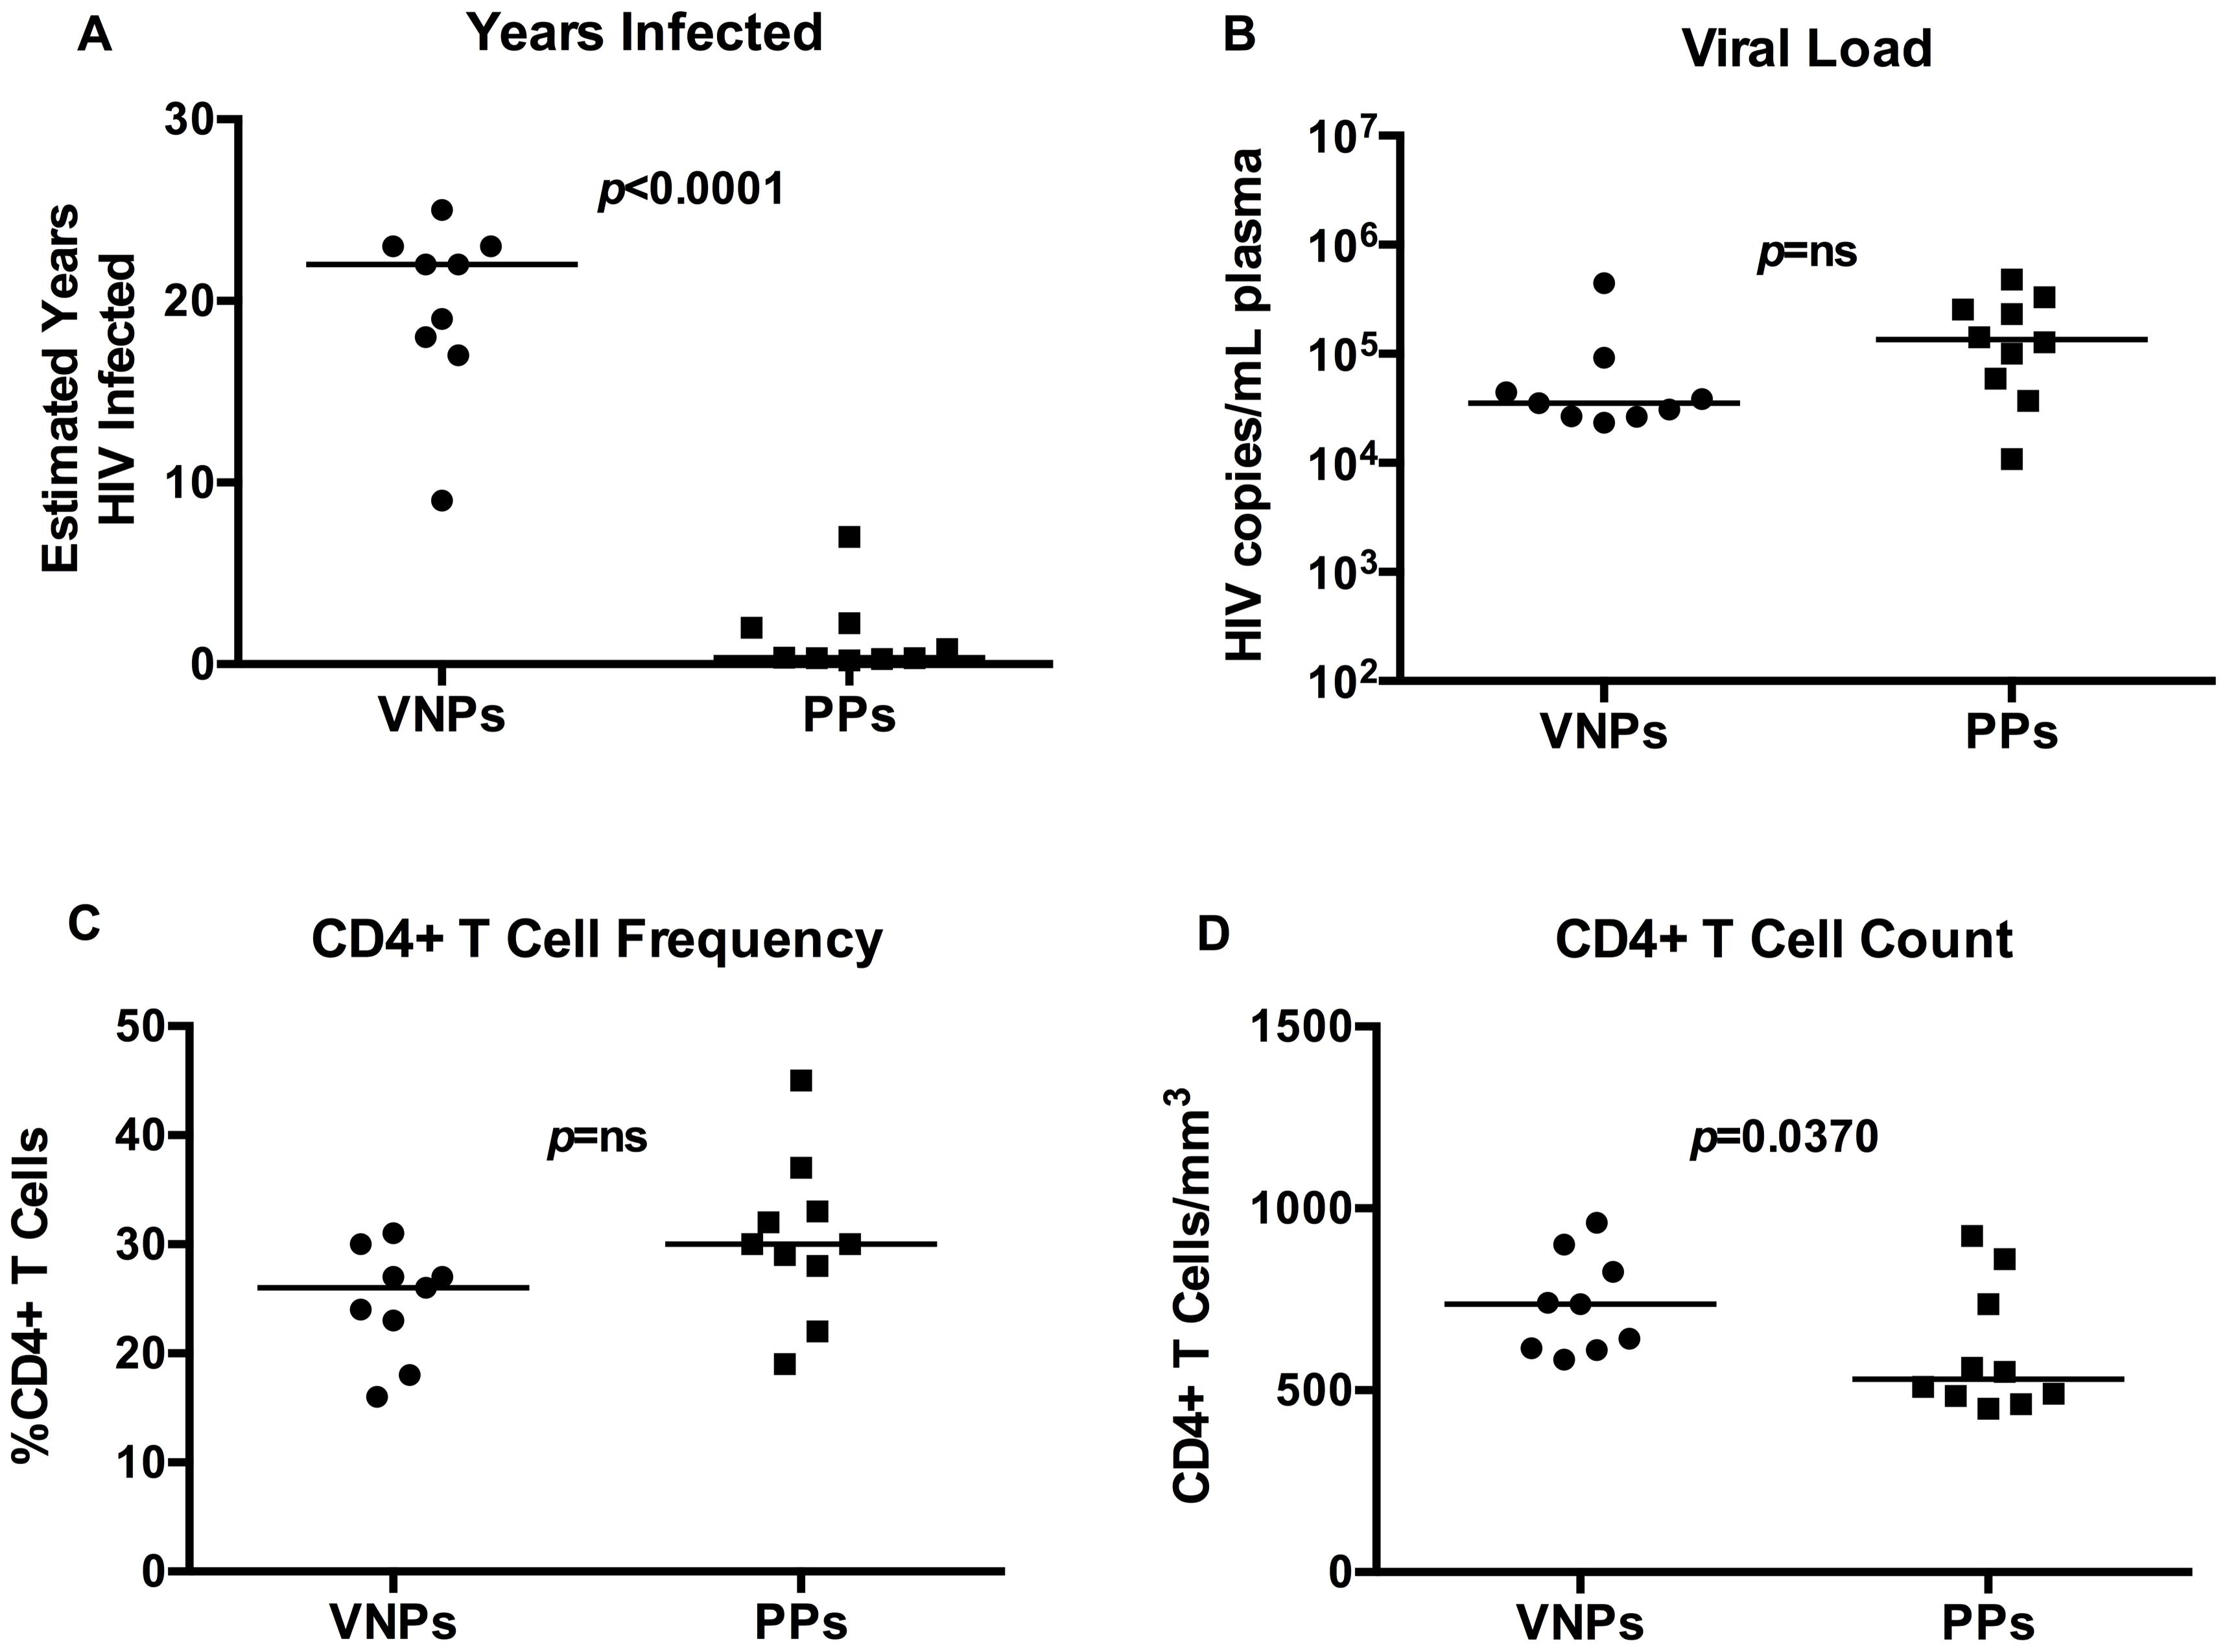 Clinical and immunological characteristics of viremic non-progressors and putative progressors.